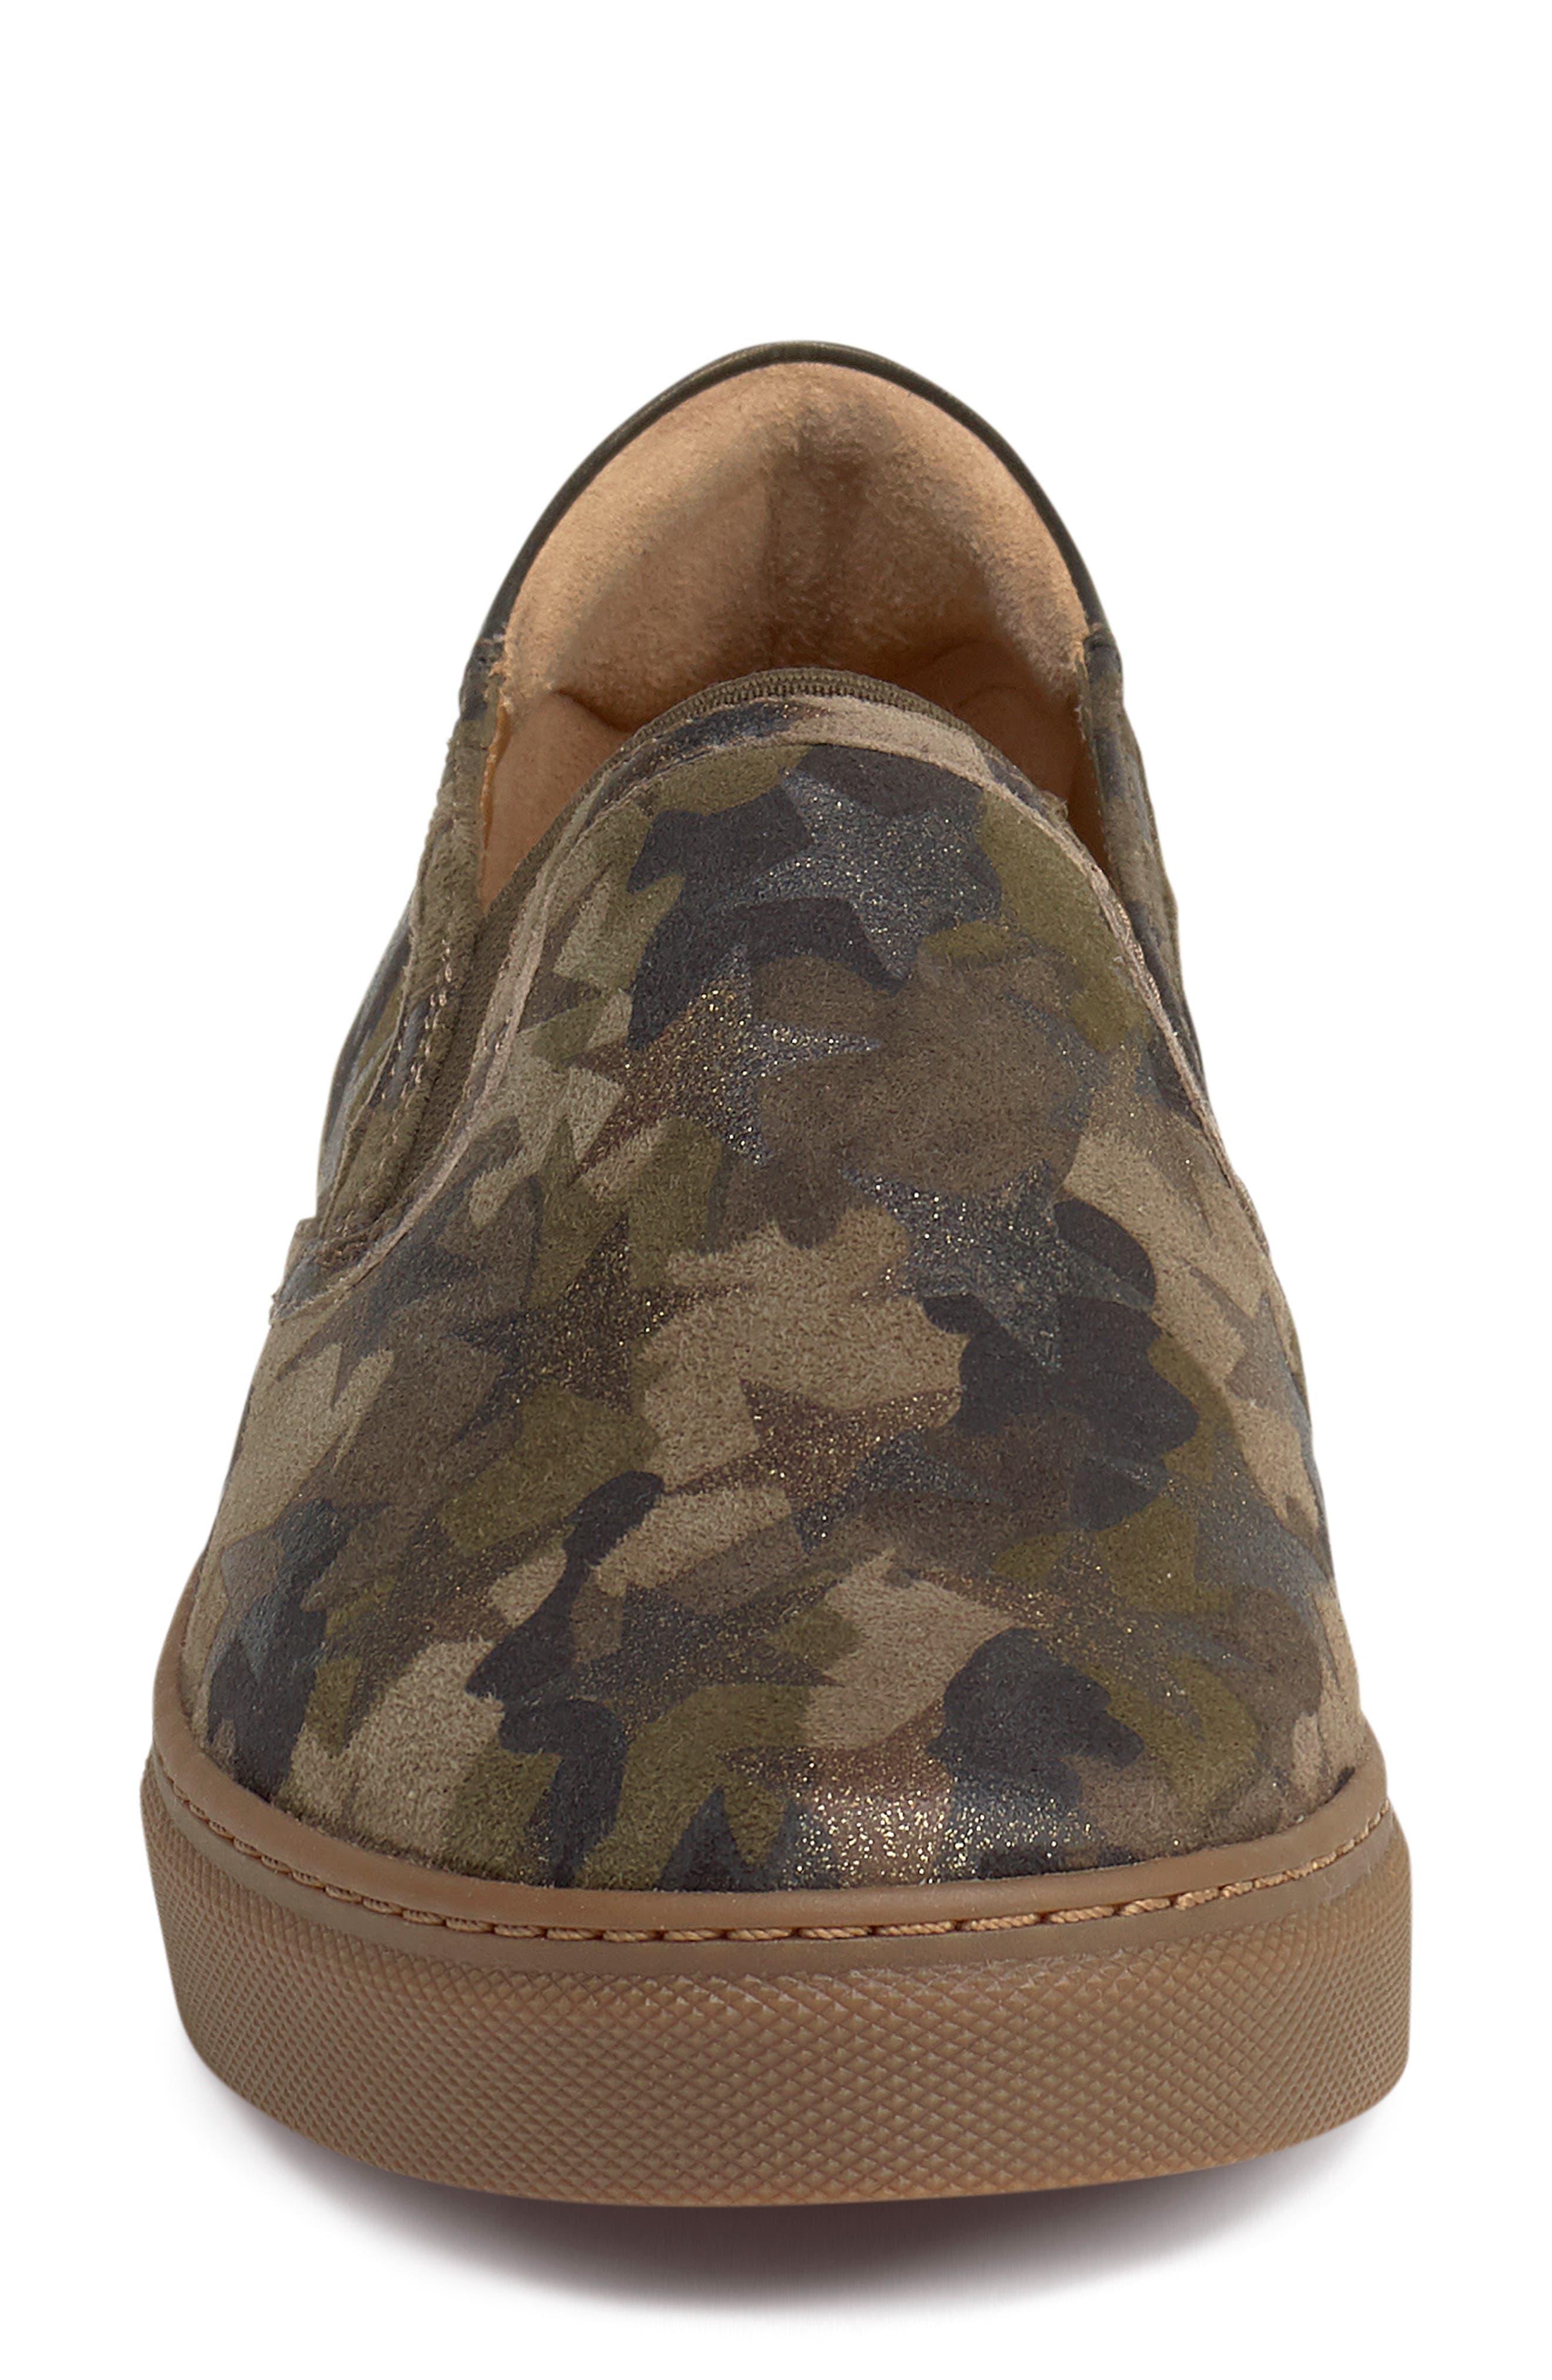 Lillian Water Resistant Slip-On Sneaker,                             Alternate thumbnail 4, color,                             OLIVE STAR PRINT SUEDE